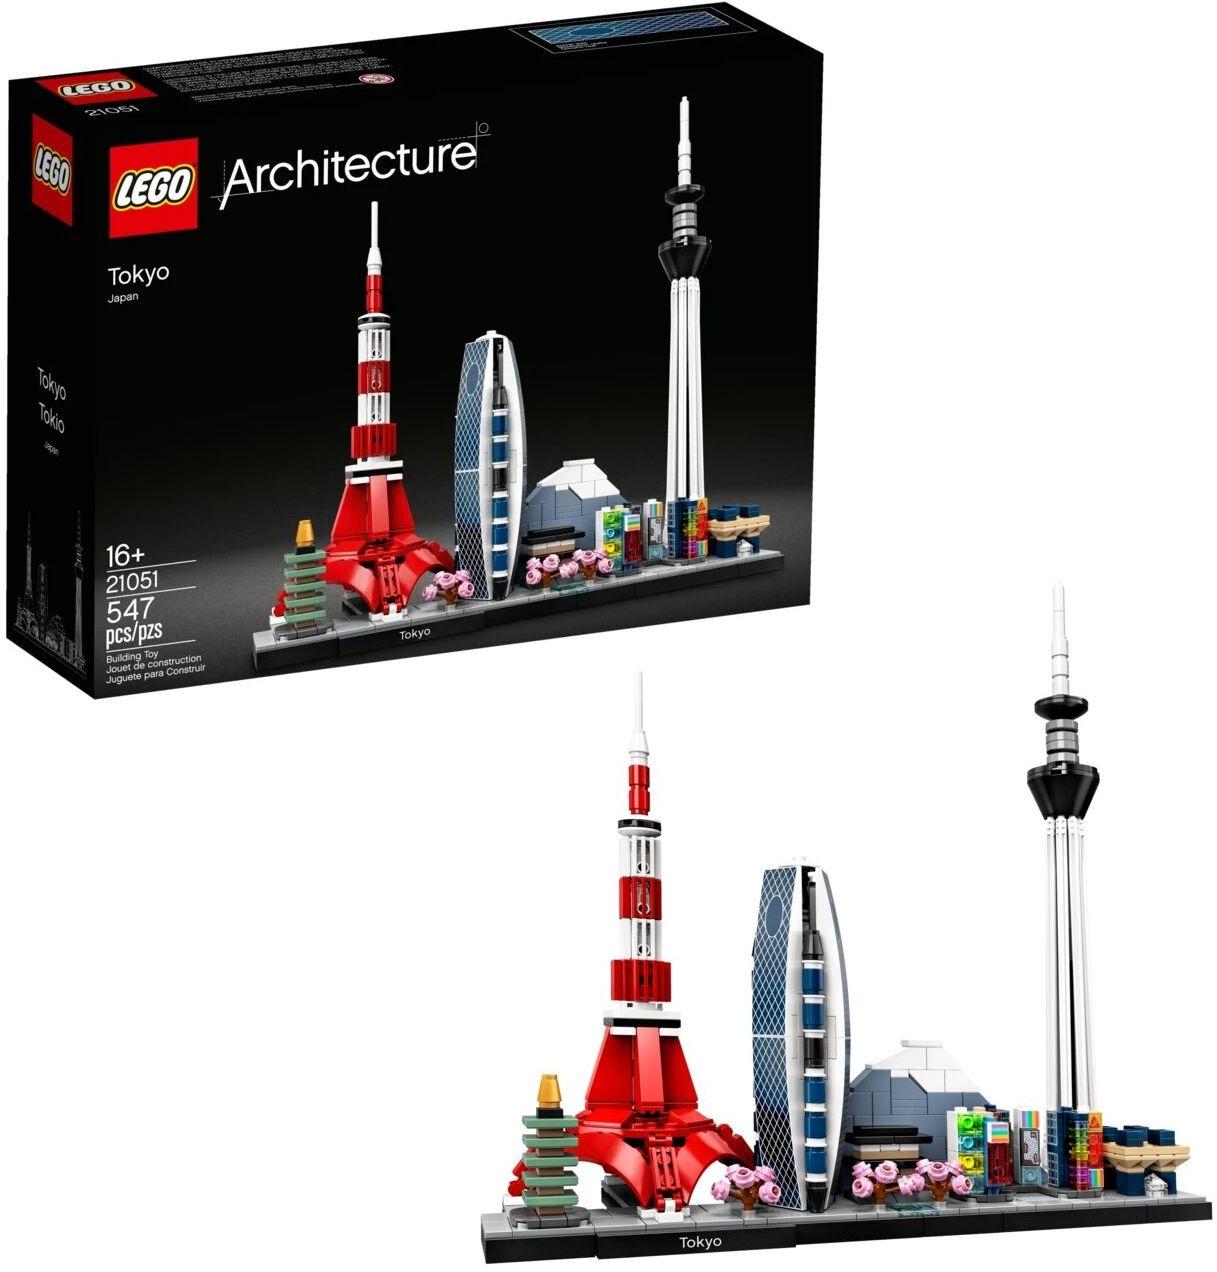 Klocki Lego 21051 Architecture Tokyo